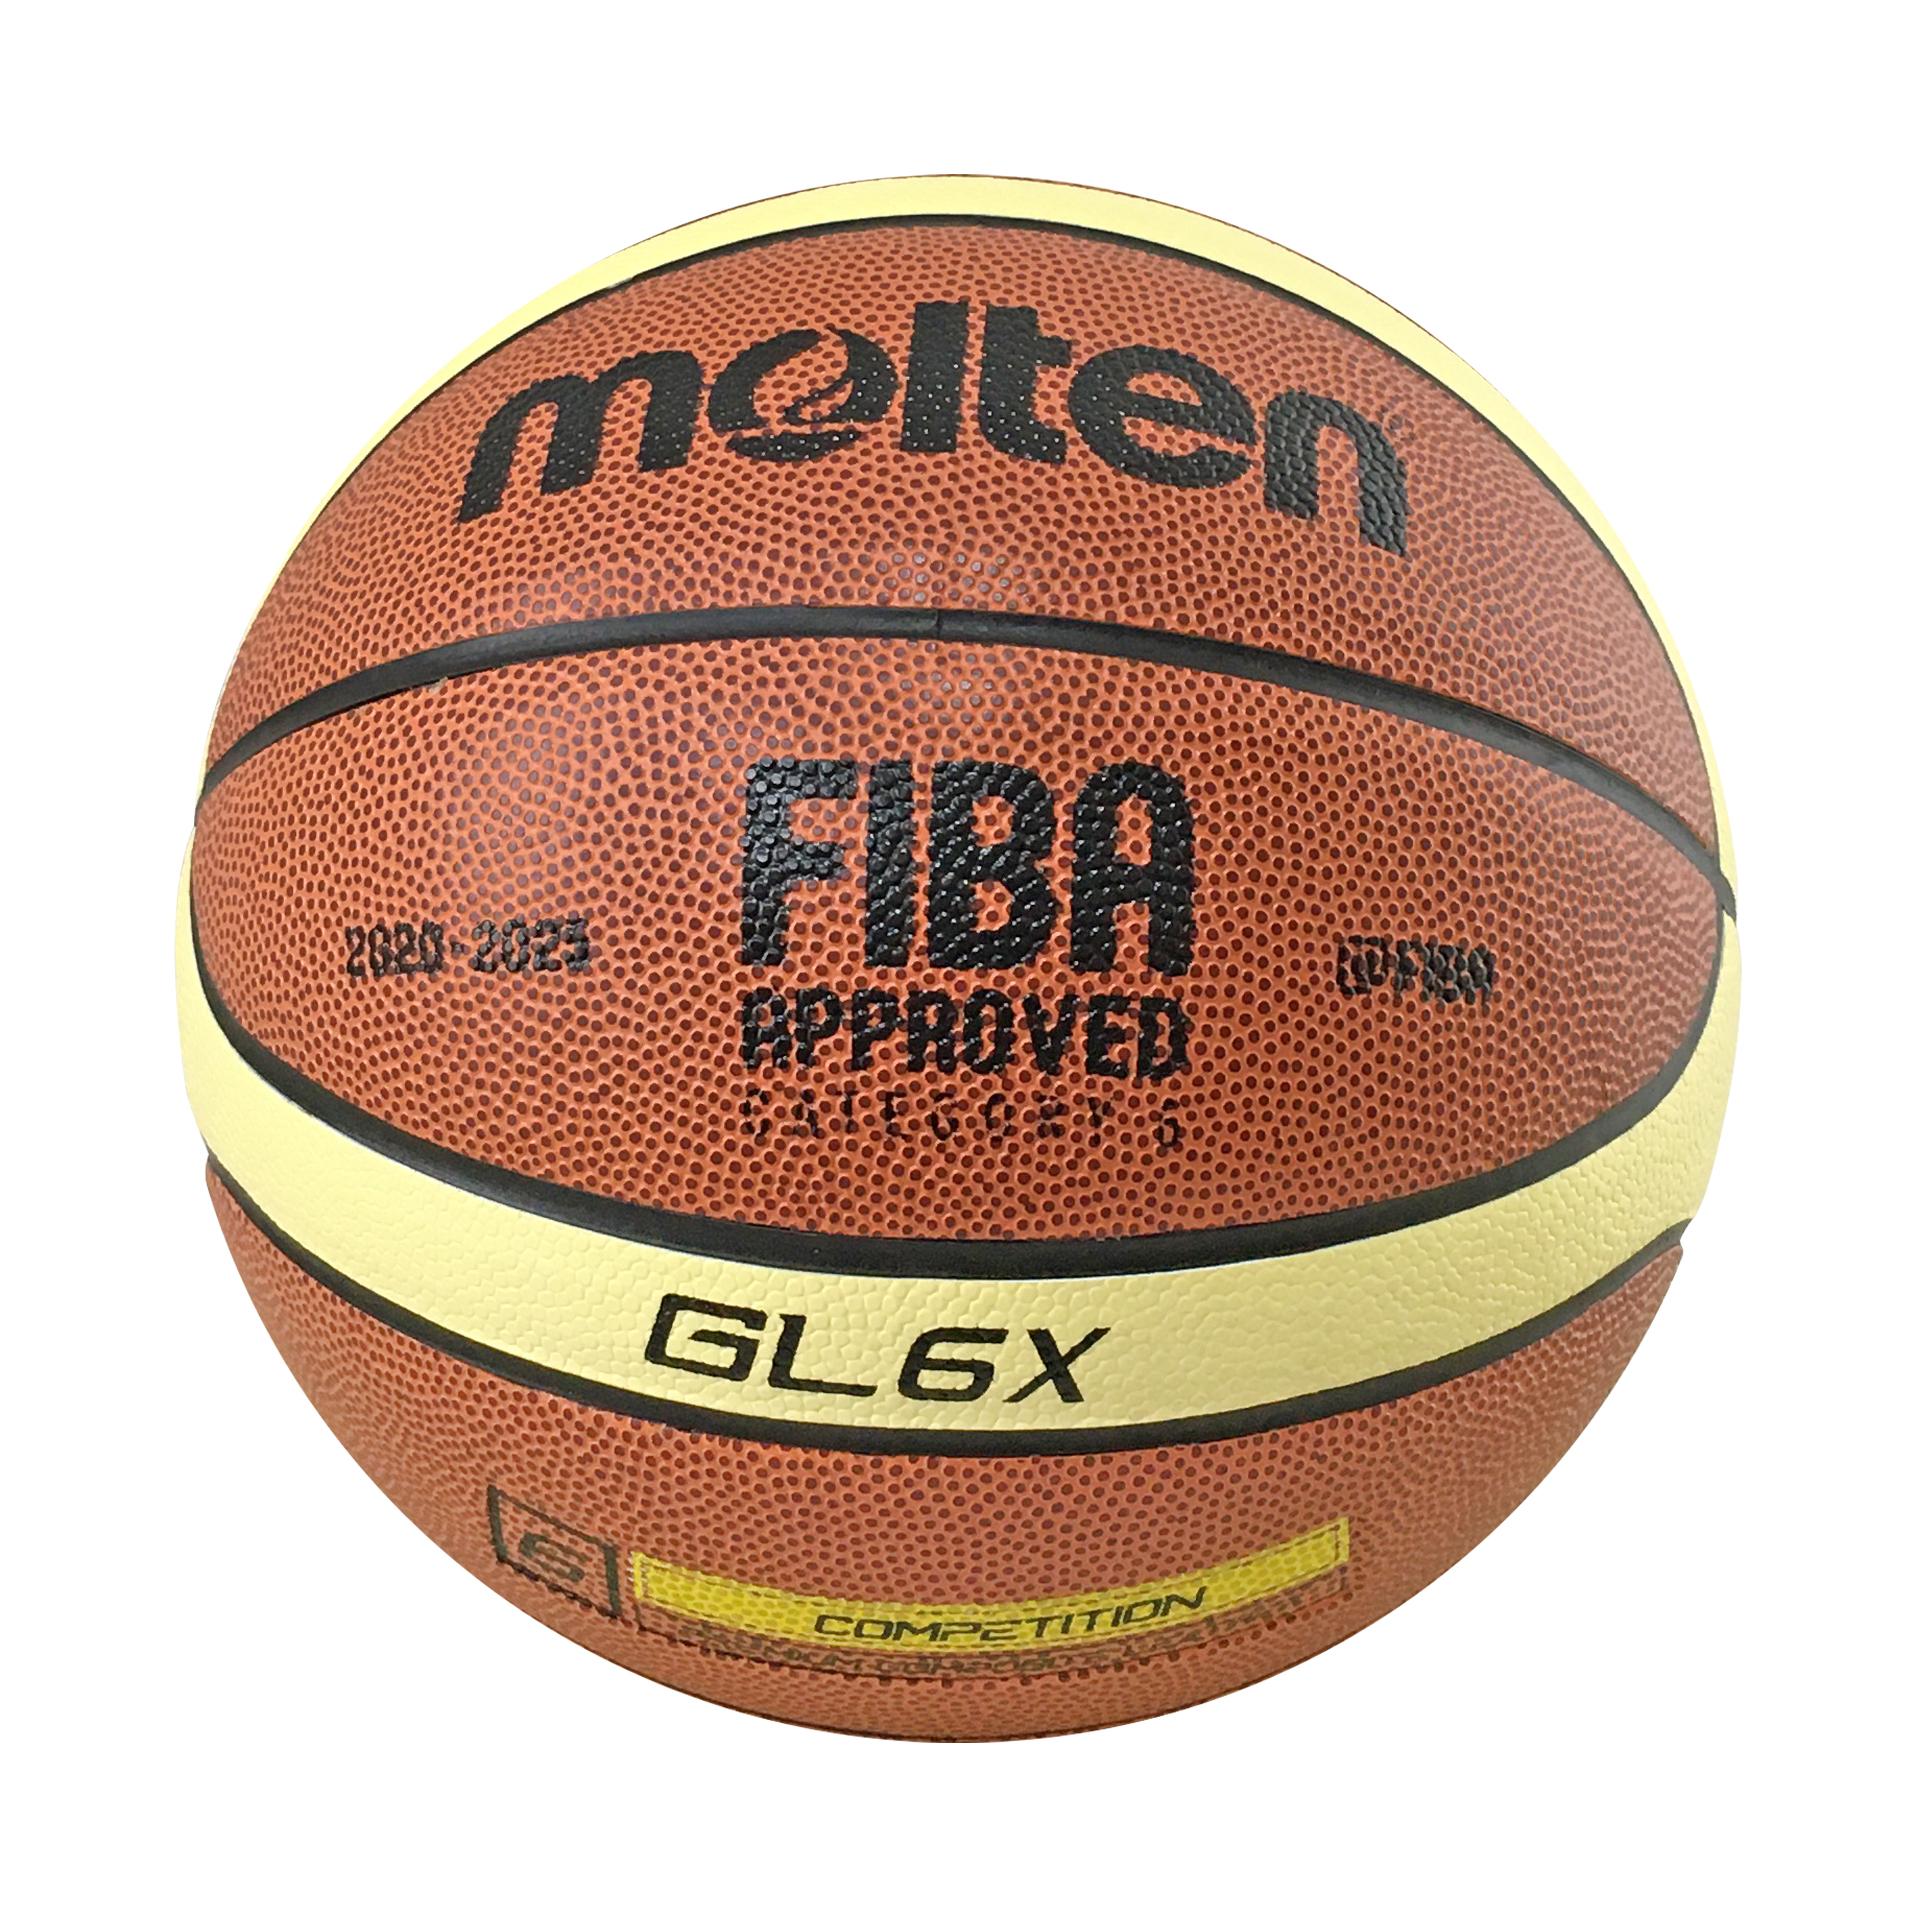 توپ بسکتبال مدل جی ال 6 ایکس غیر اصل